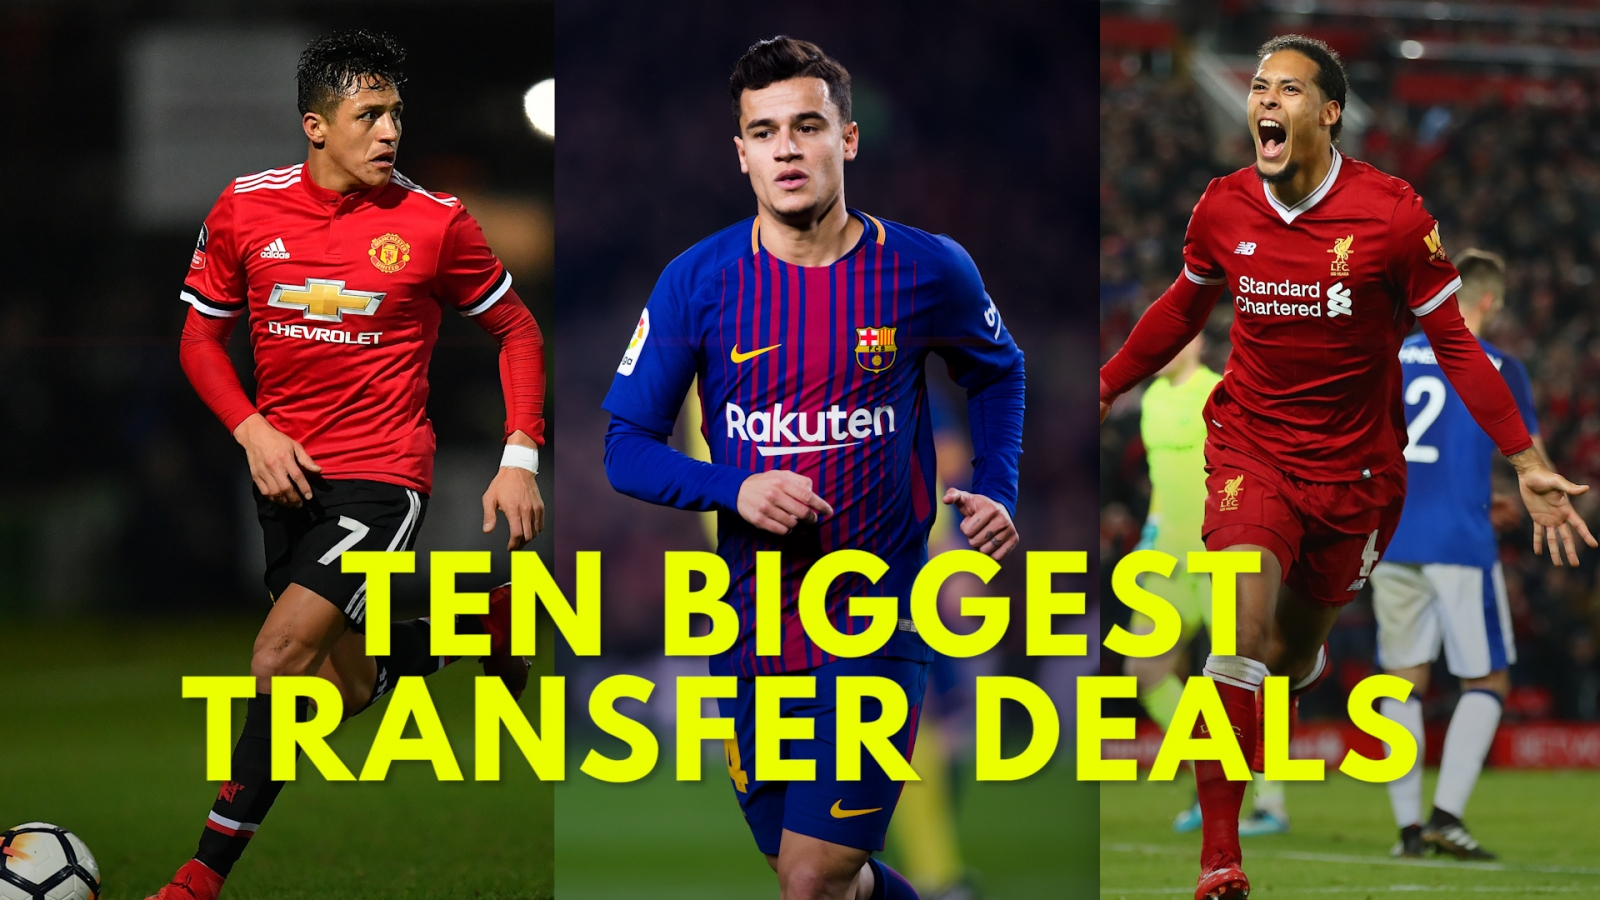 Ten Biggest Premier League January Transfer Deals Of 2018